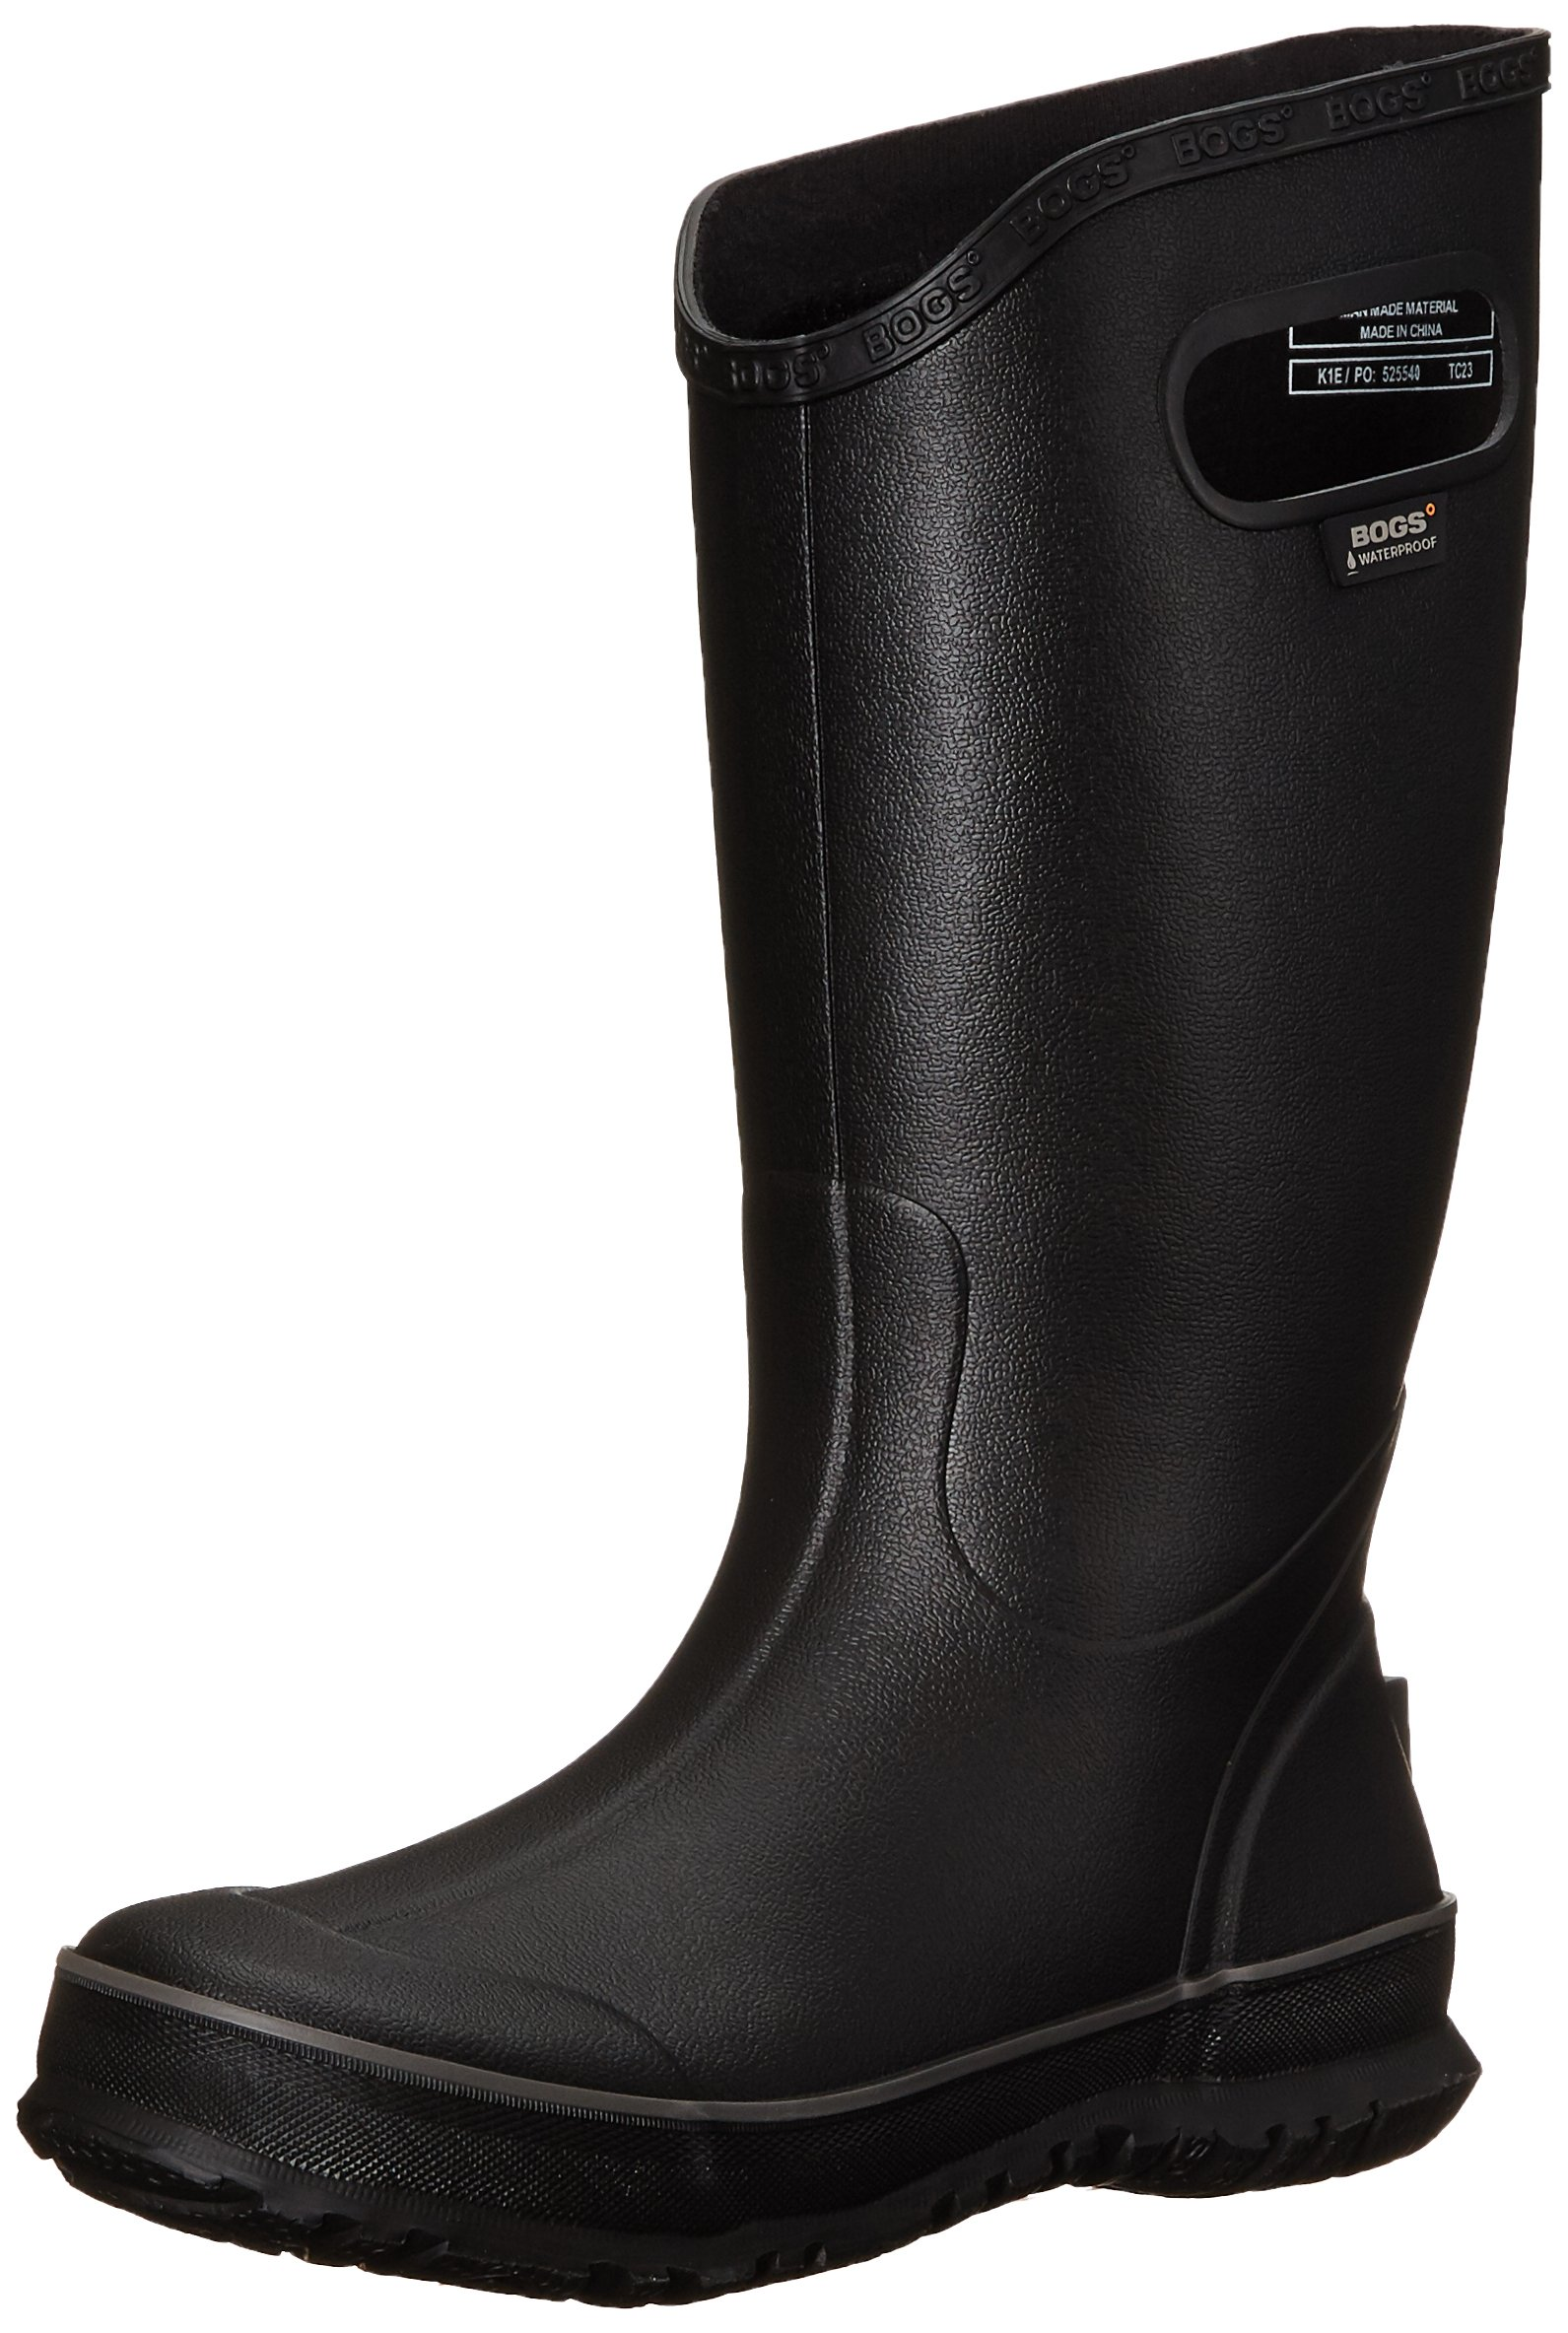 Bogs Men's Waterproof Rubber Rain Boot, Black, 13 D(M) US